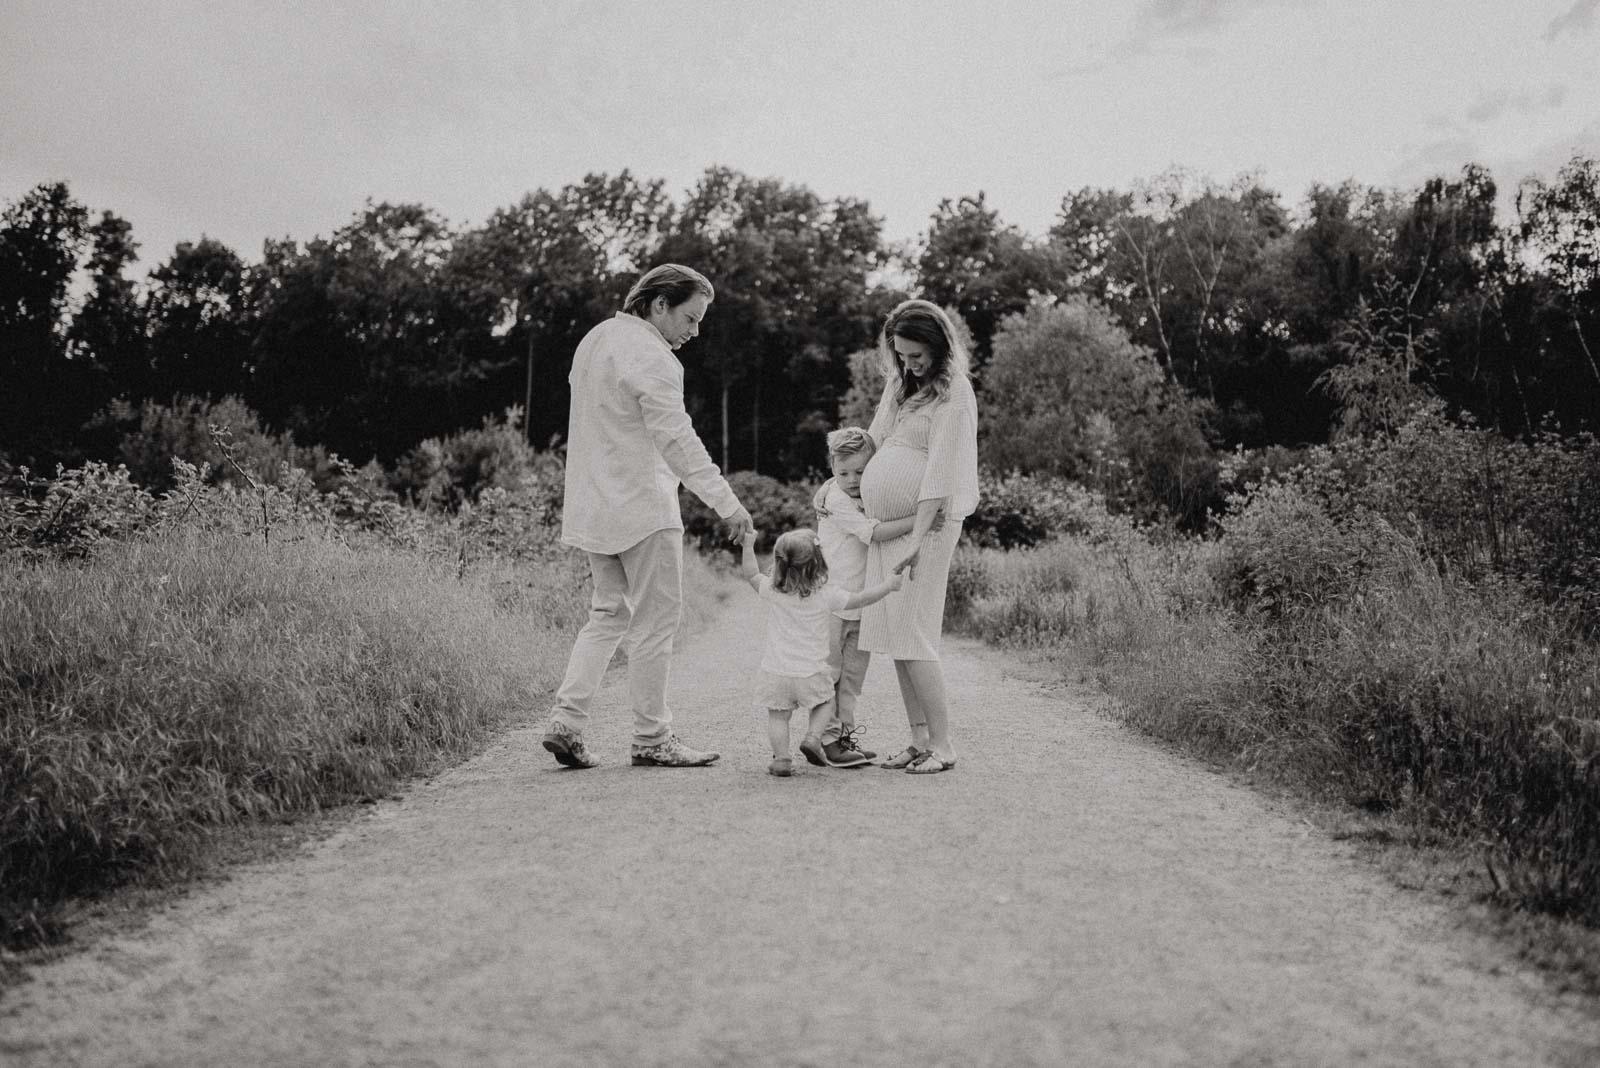 007-familien-fotoshooting-herne-heide